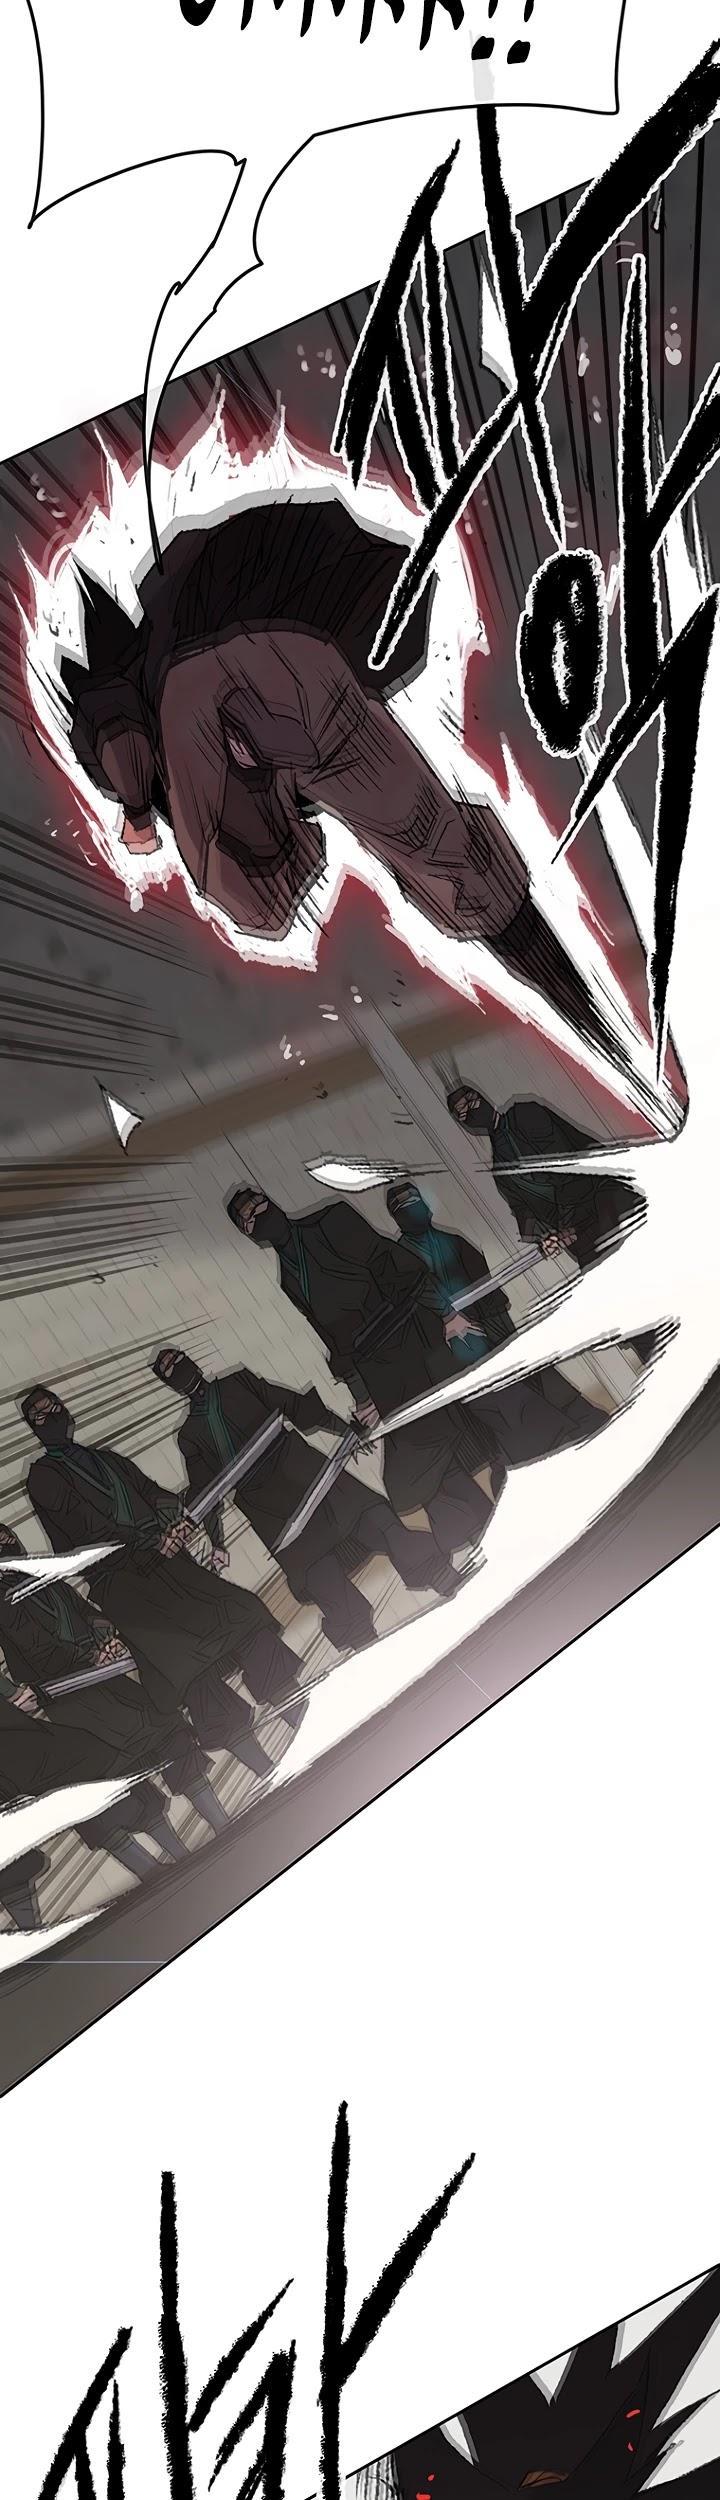 The Undefeatable Swordsman Chapter 73 page 45 - Mangakakalots.com